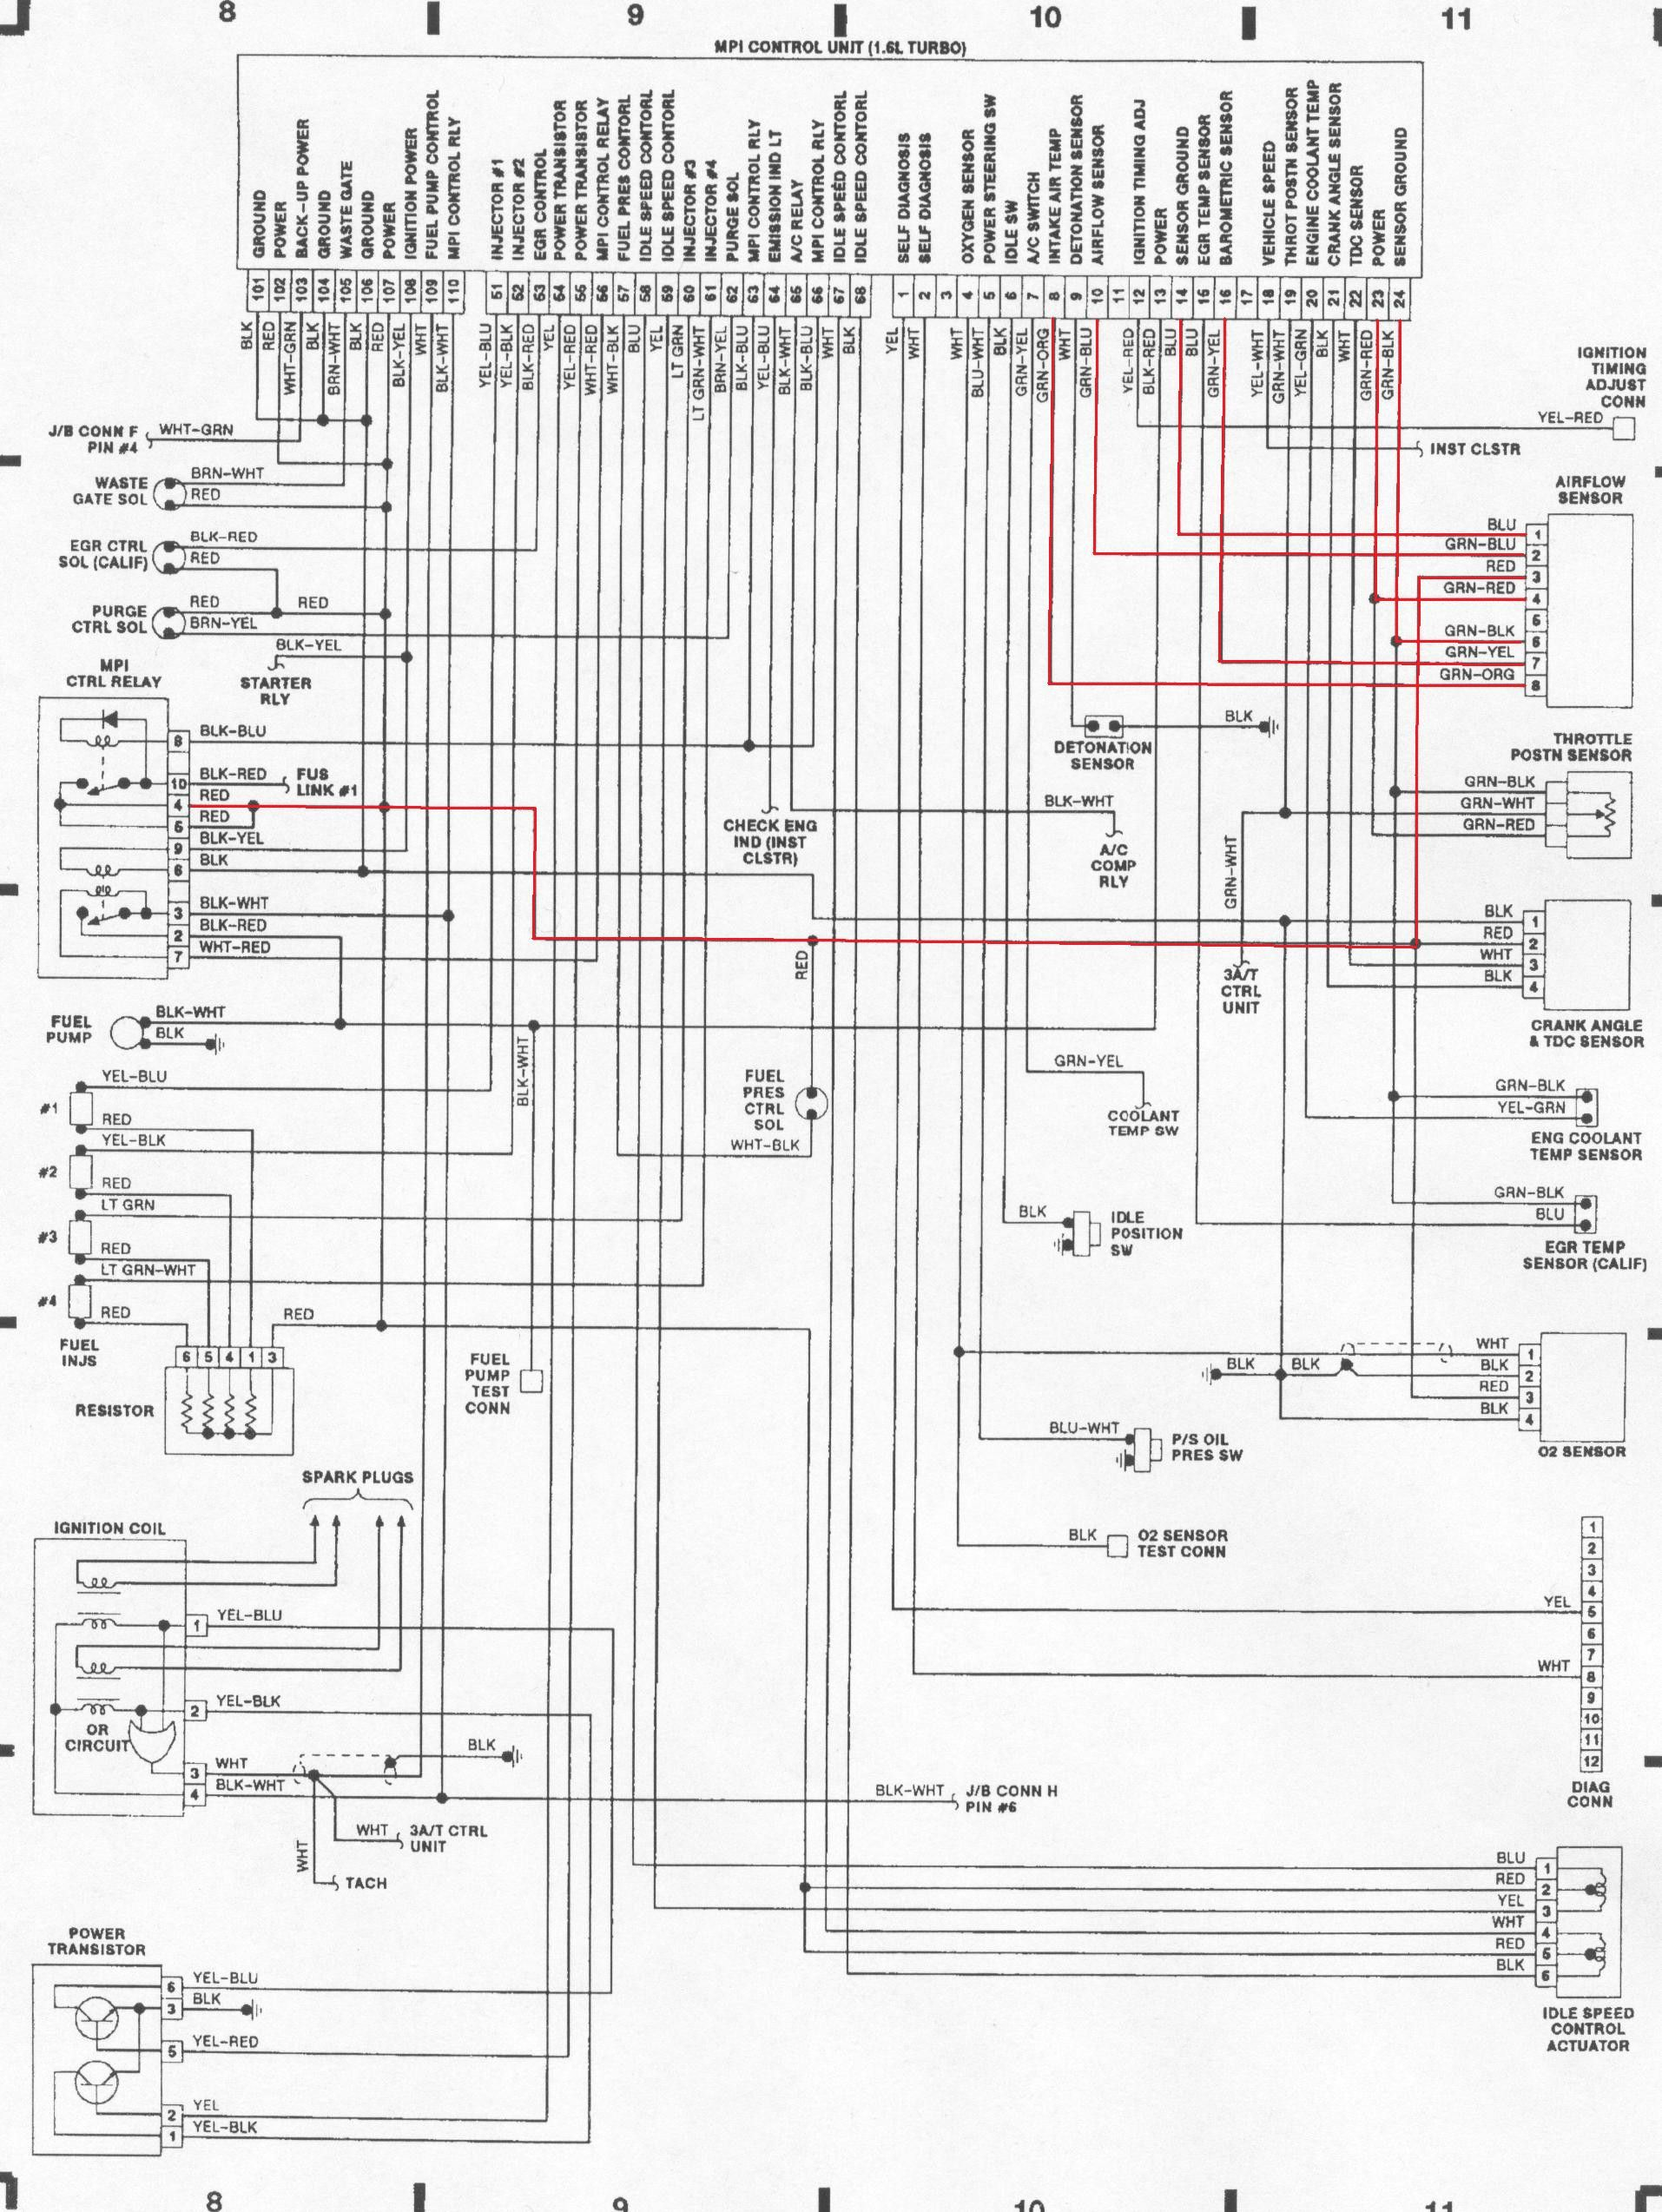 Miraculous Wiring Diagram 4G15 Pdf Virtual Fretboard Inside Mitsubishi Mirage Wiring Cloud Rdonaheevemohammedshrineorg